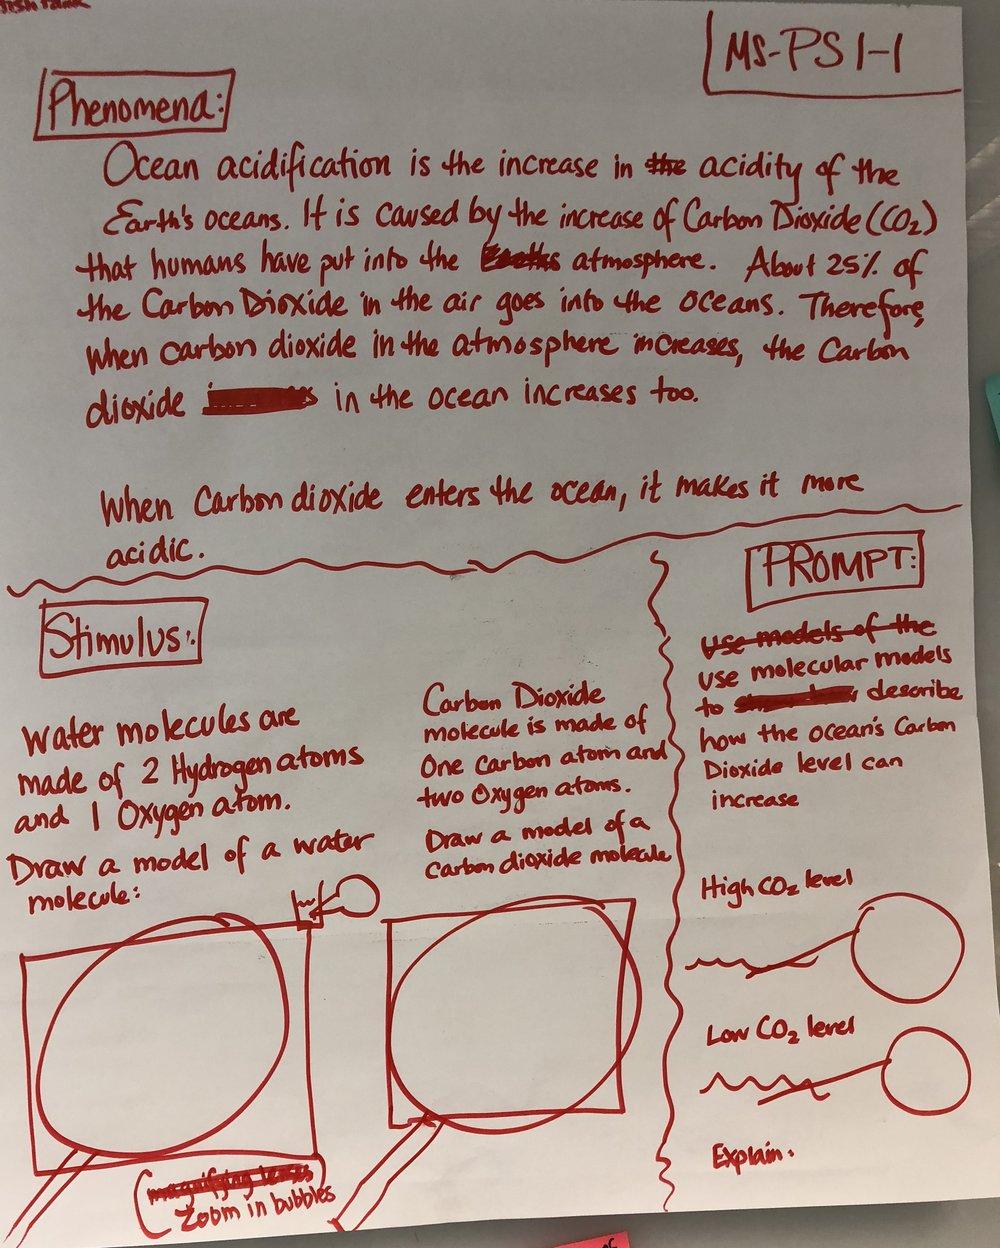 Ms Ps1 1 The Wonder Of Science Oxygen Atom Model Atomic Diagram Jun 4 2018